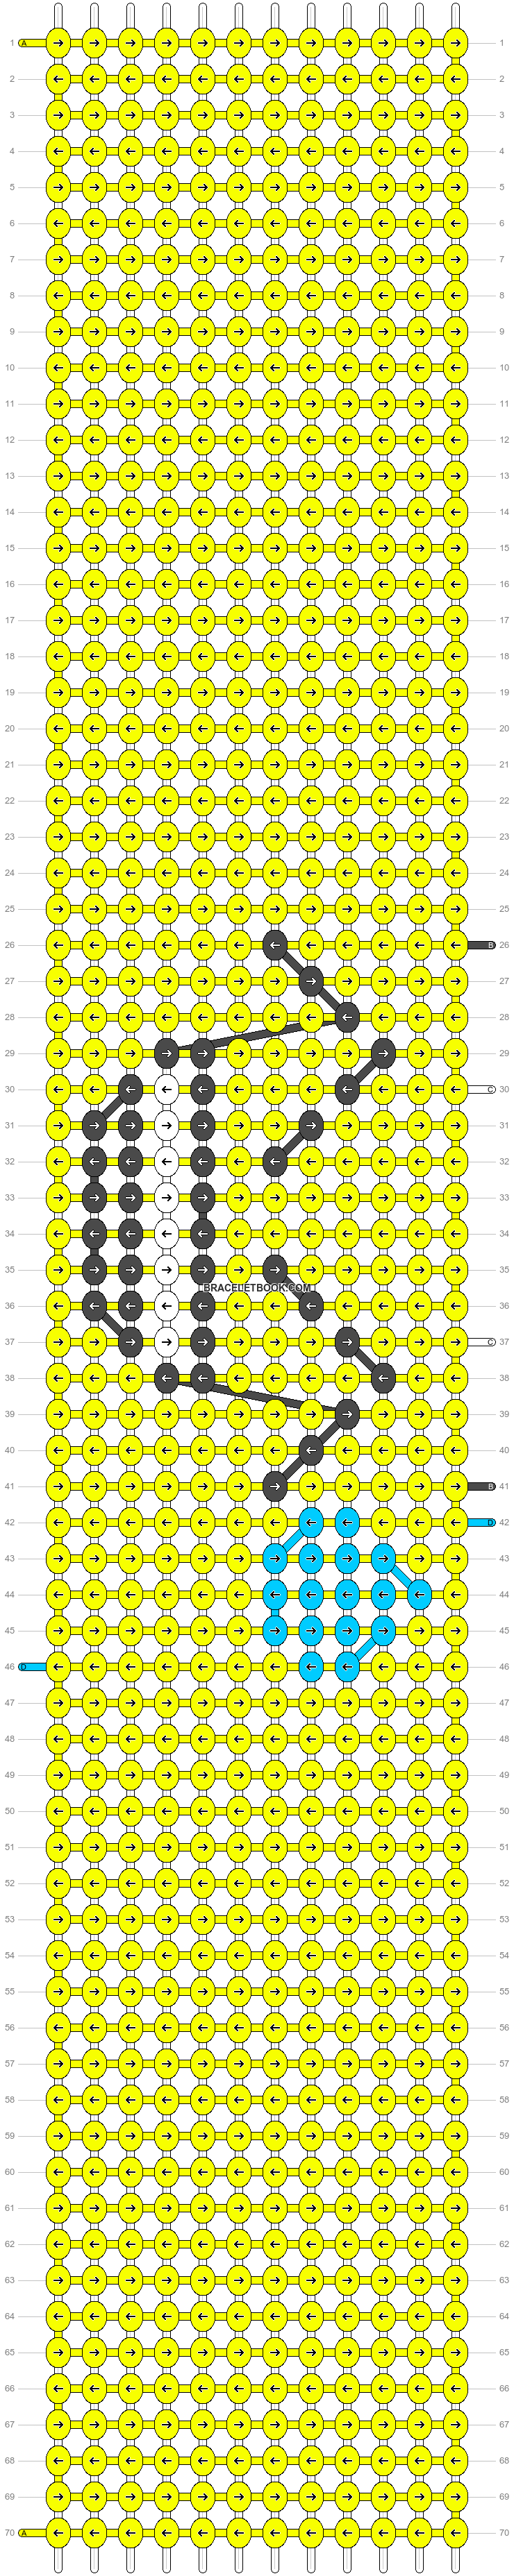 Alpha pattern #94448 pattern